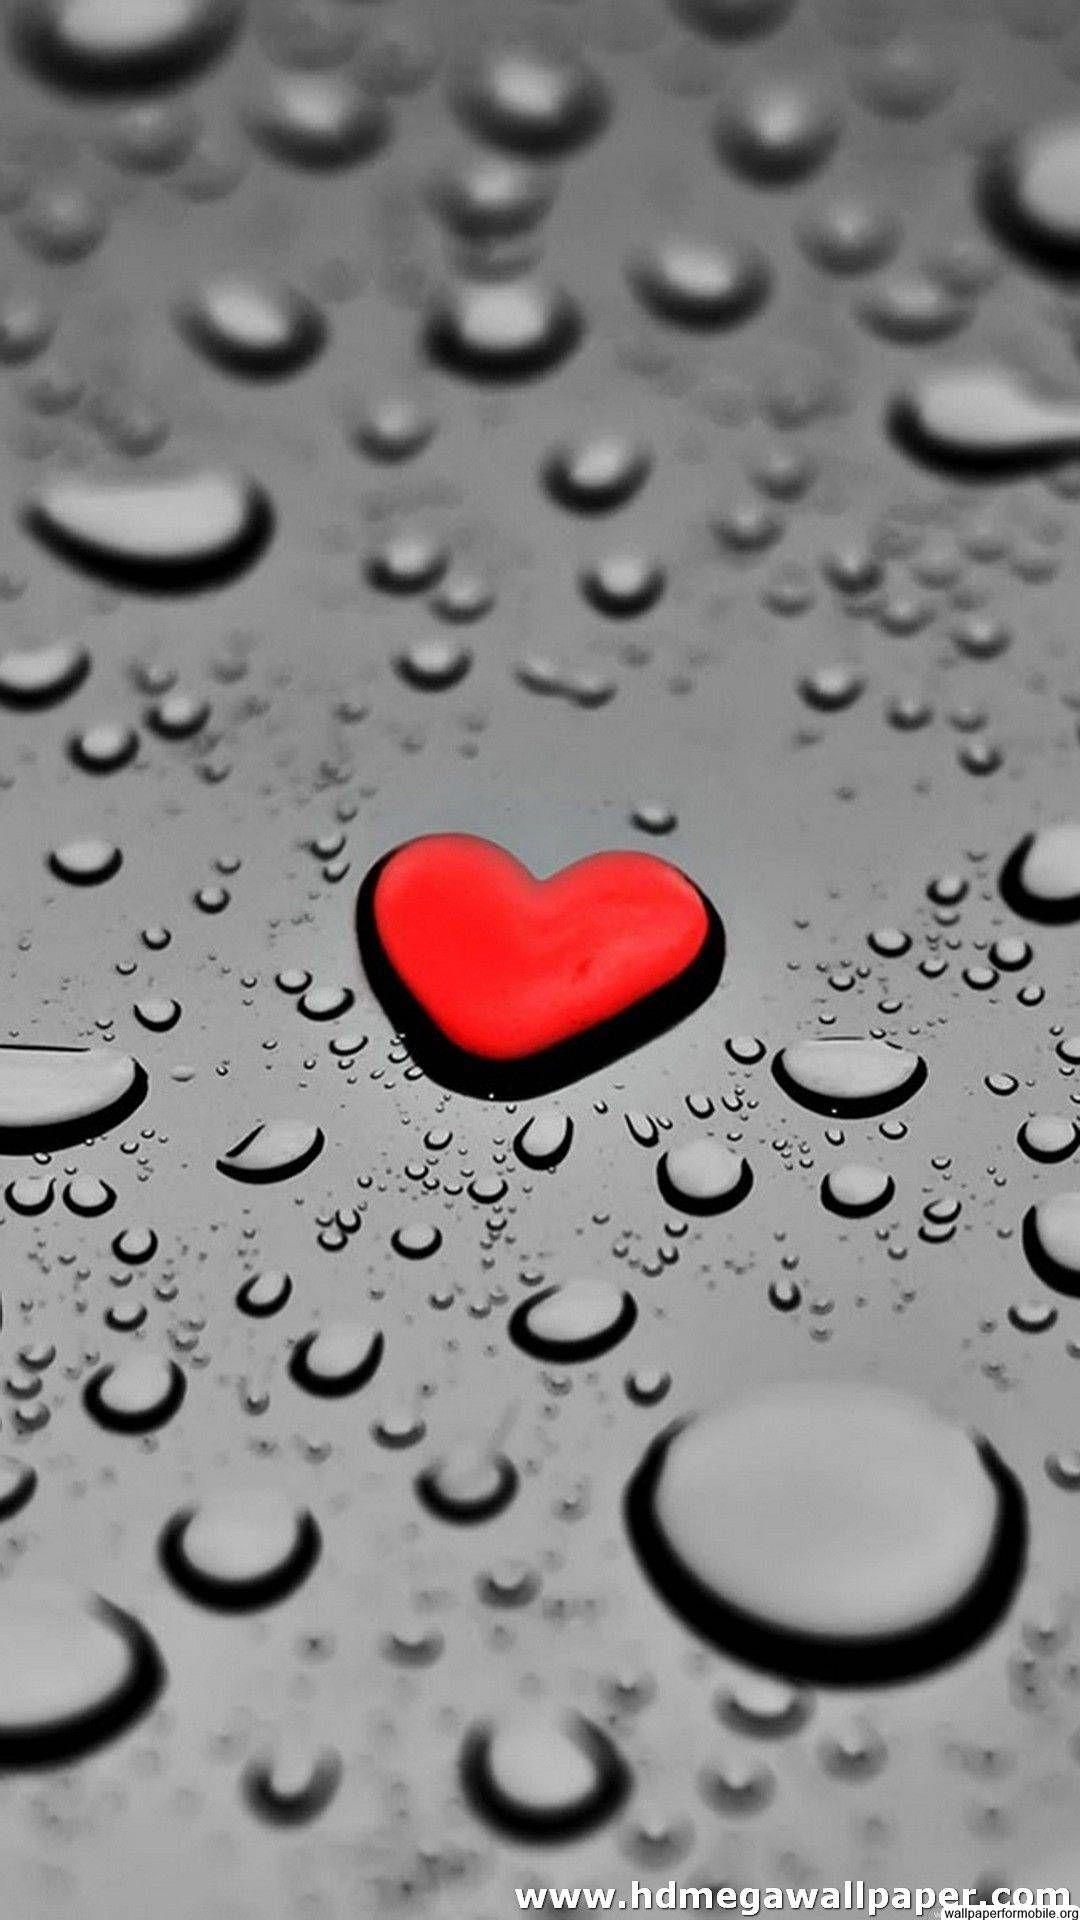 Http Wallpaperformobile Org 12165 Best Wallpapers For Mobile Love Html Best Wallpapers For Valentines Wallpaper Iphone Valentines Wallpaper Heart Wallpaper